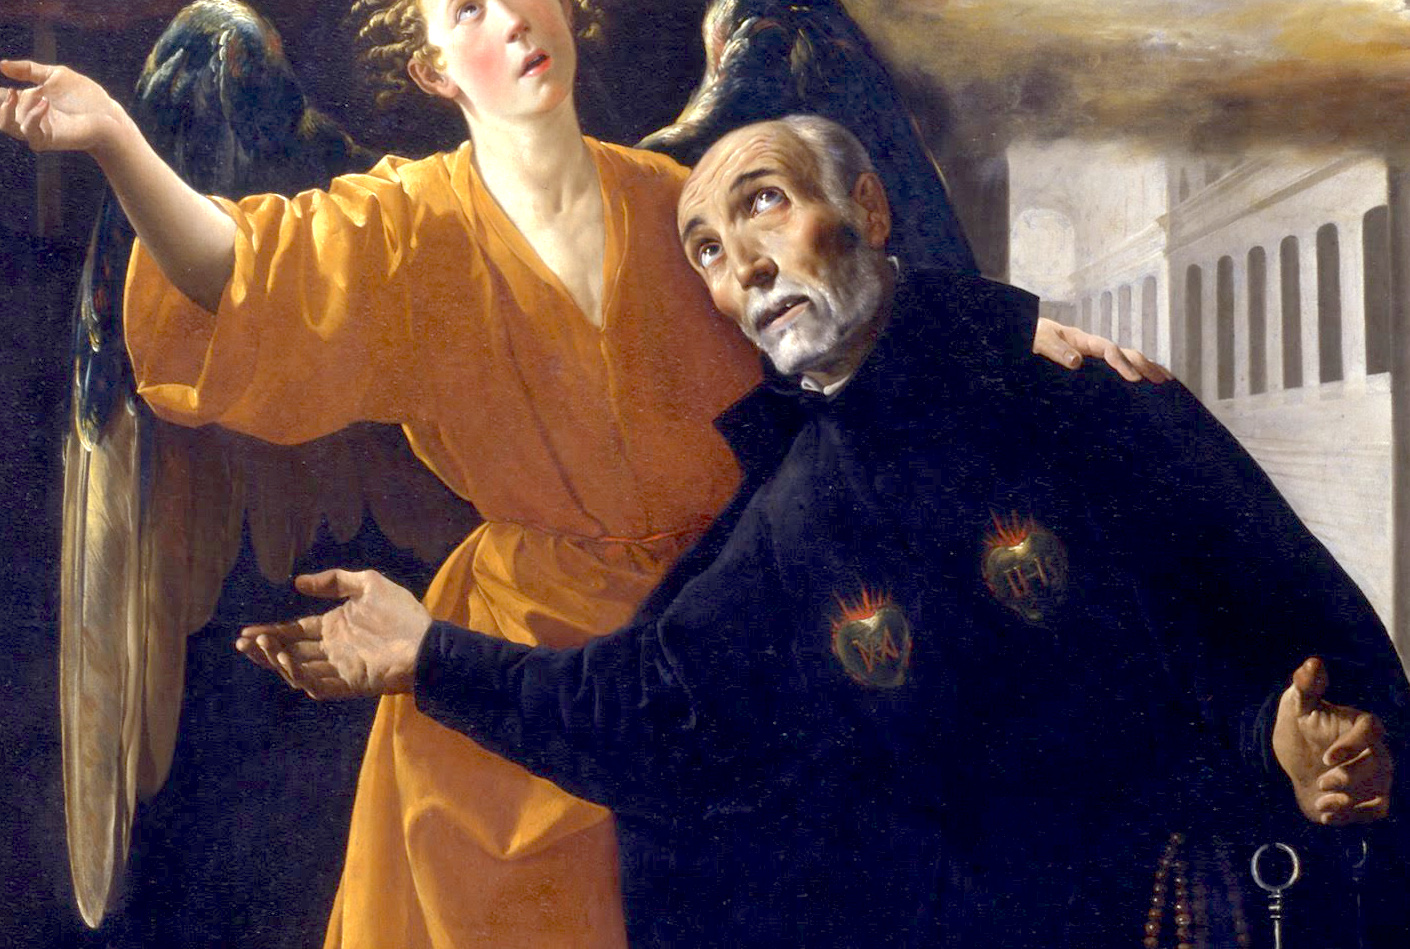 The vision of Beato Alonso Rodríguez - Paint of Zurbarn at Real Academia de Bellas Artes de San Fernando